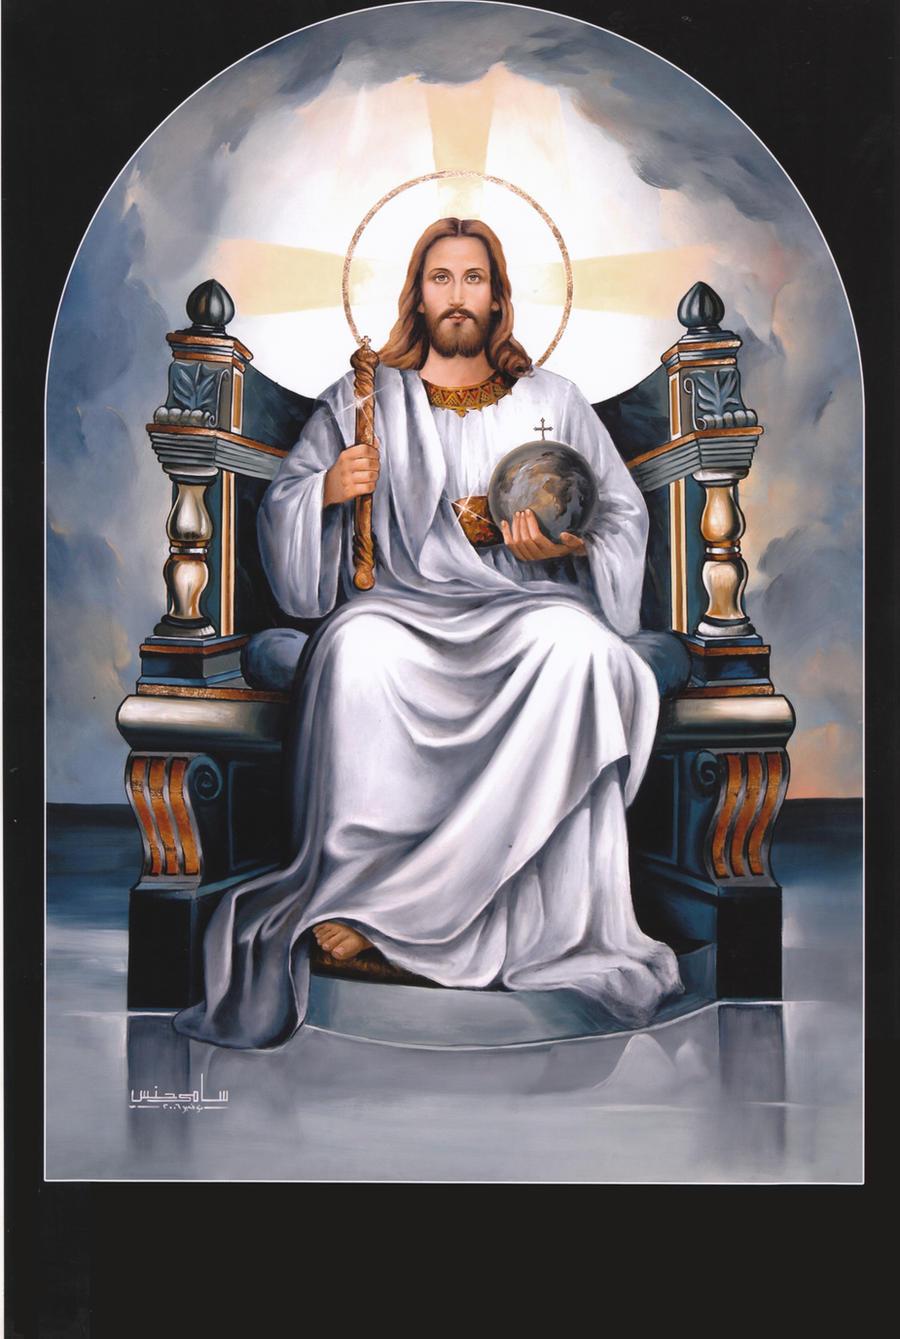 Pin by elham saliba on my jesus pinterest savior lord and amen thecheapjerseys Choice Image